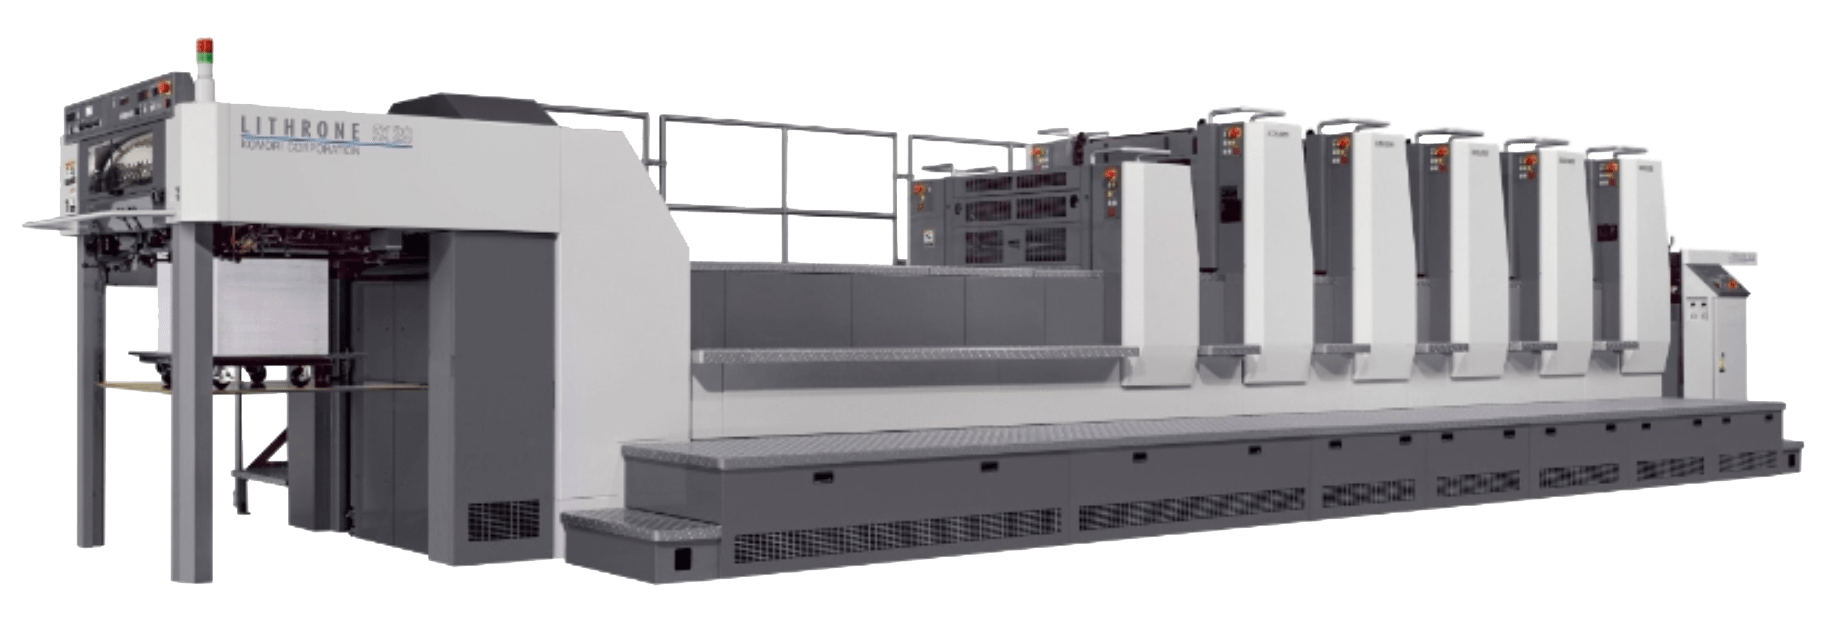 Komori Lithrone offset printing press